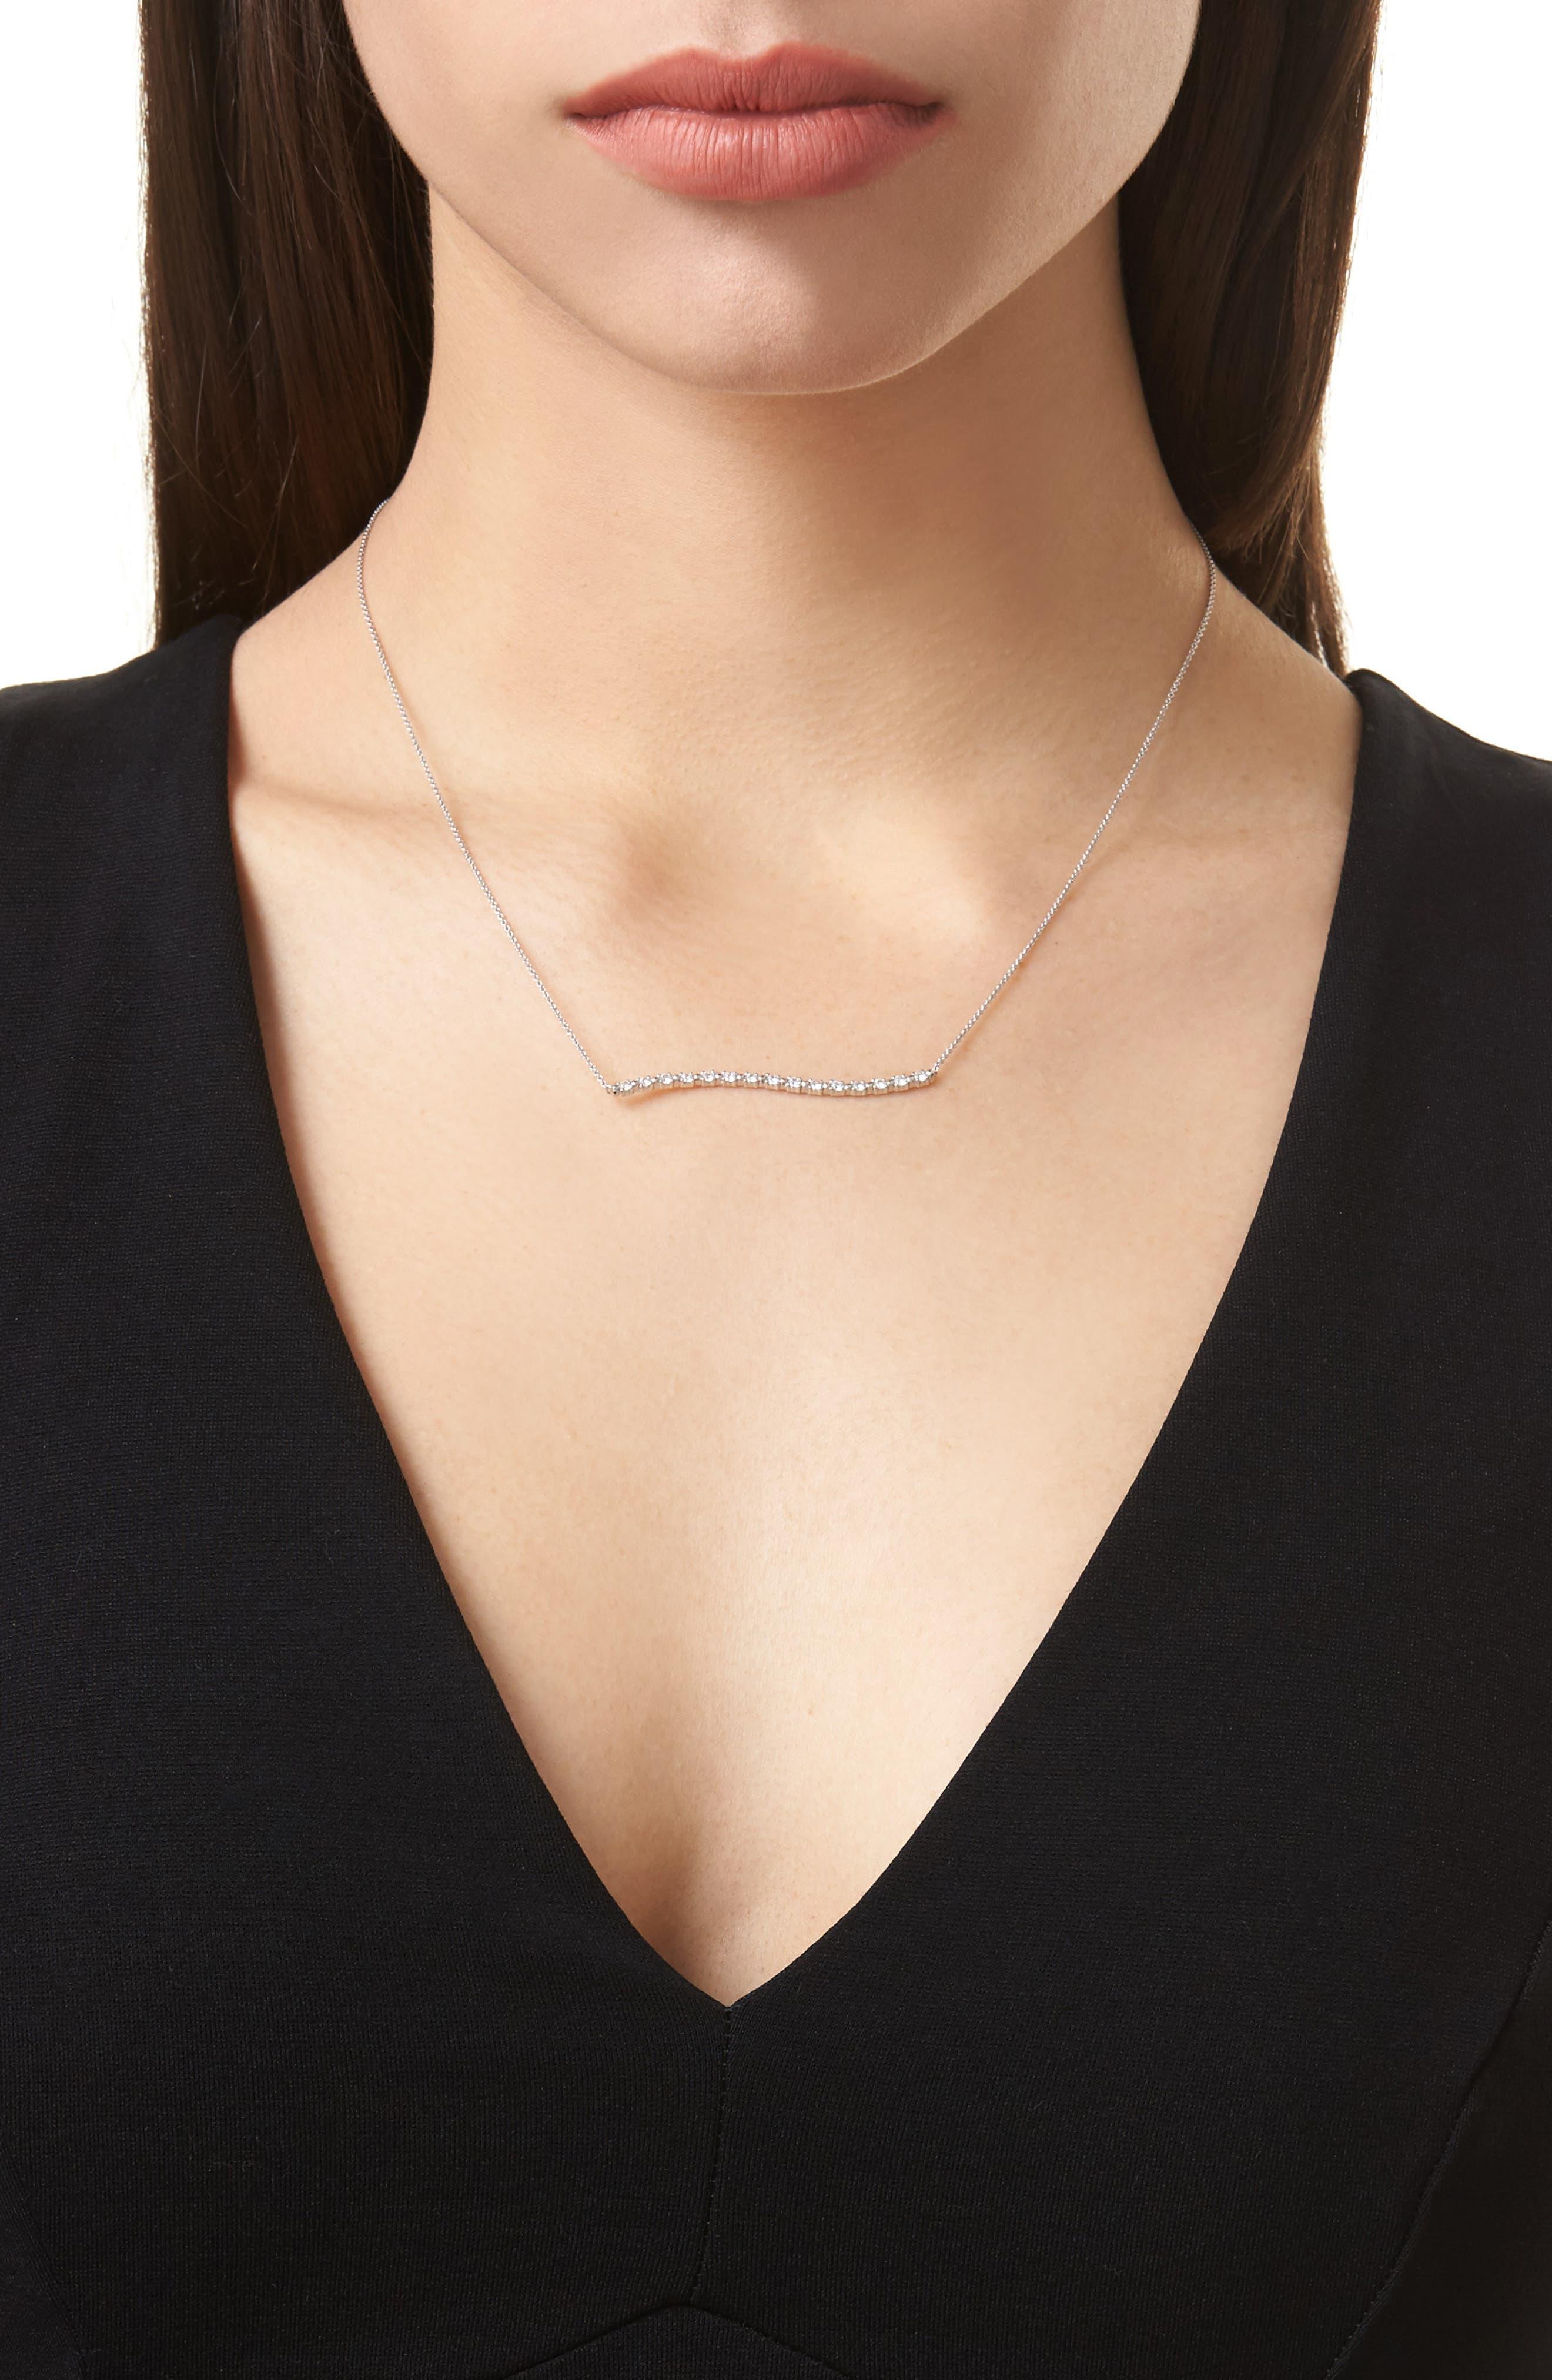 Wavy Bar Diamond Pendant Necklace,                             Alternate thumbnail 2, color,                             711